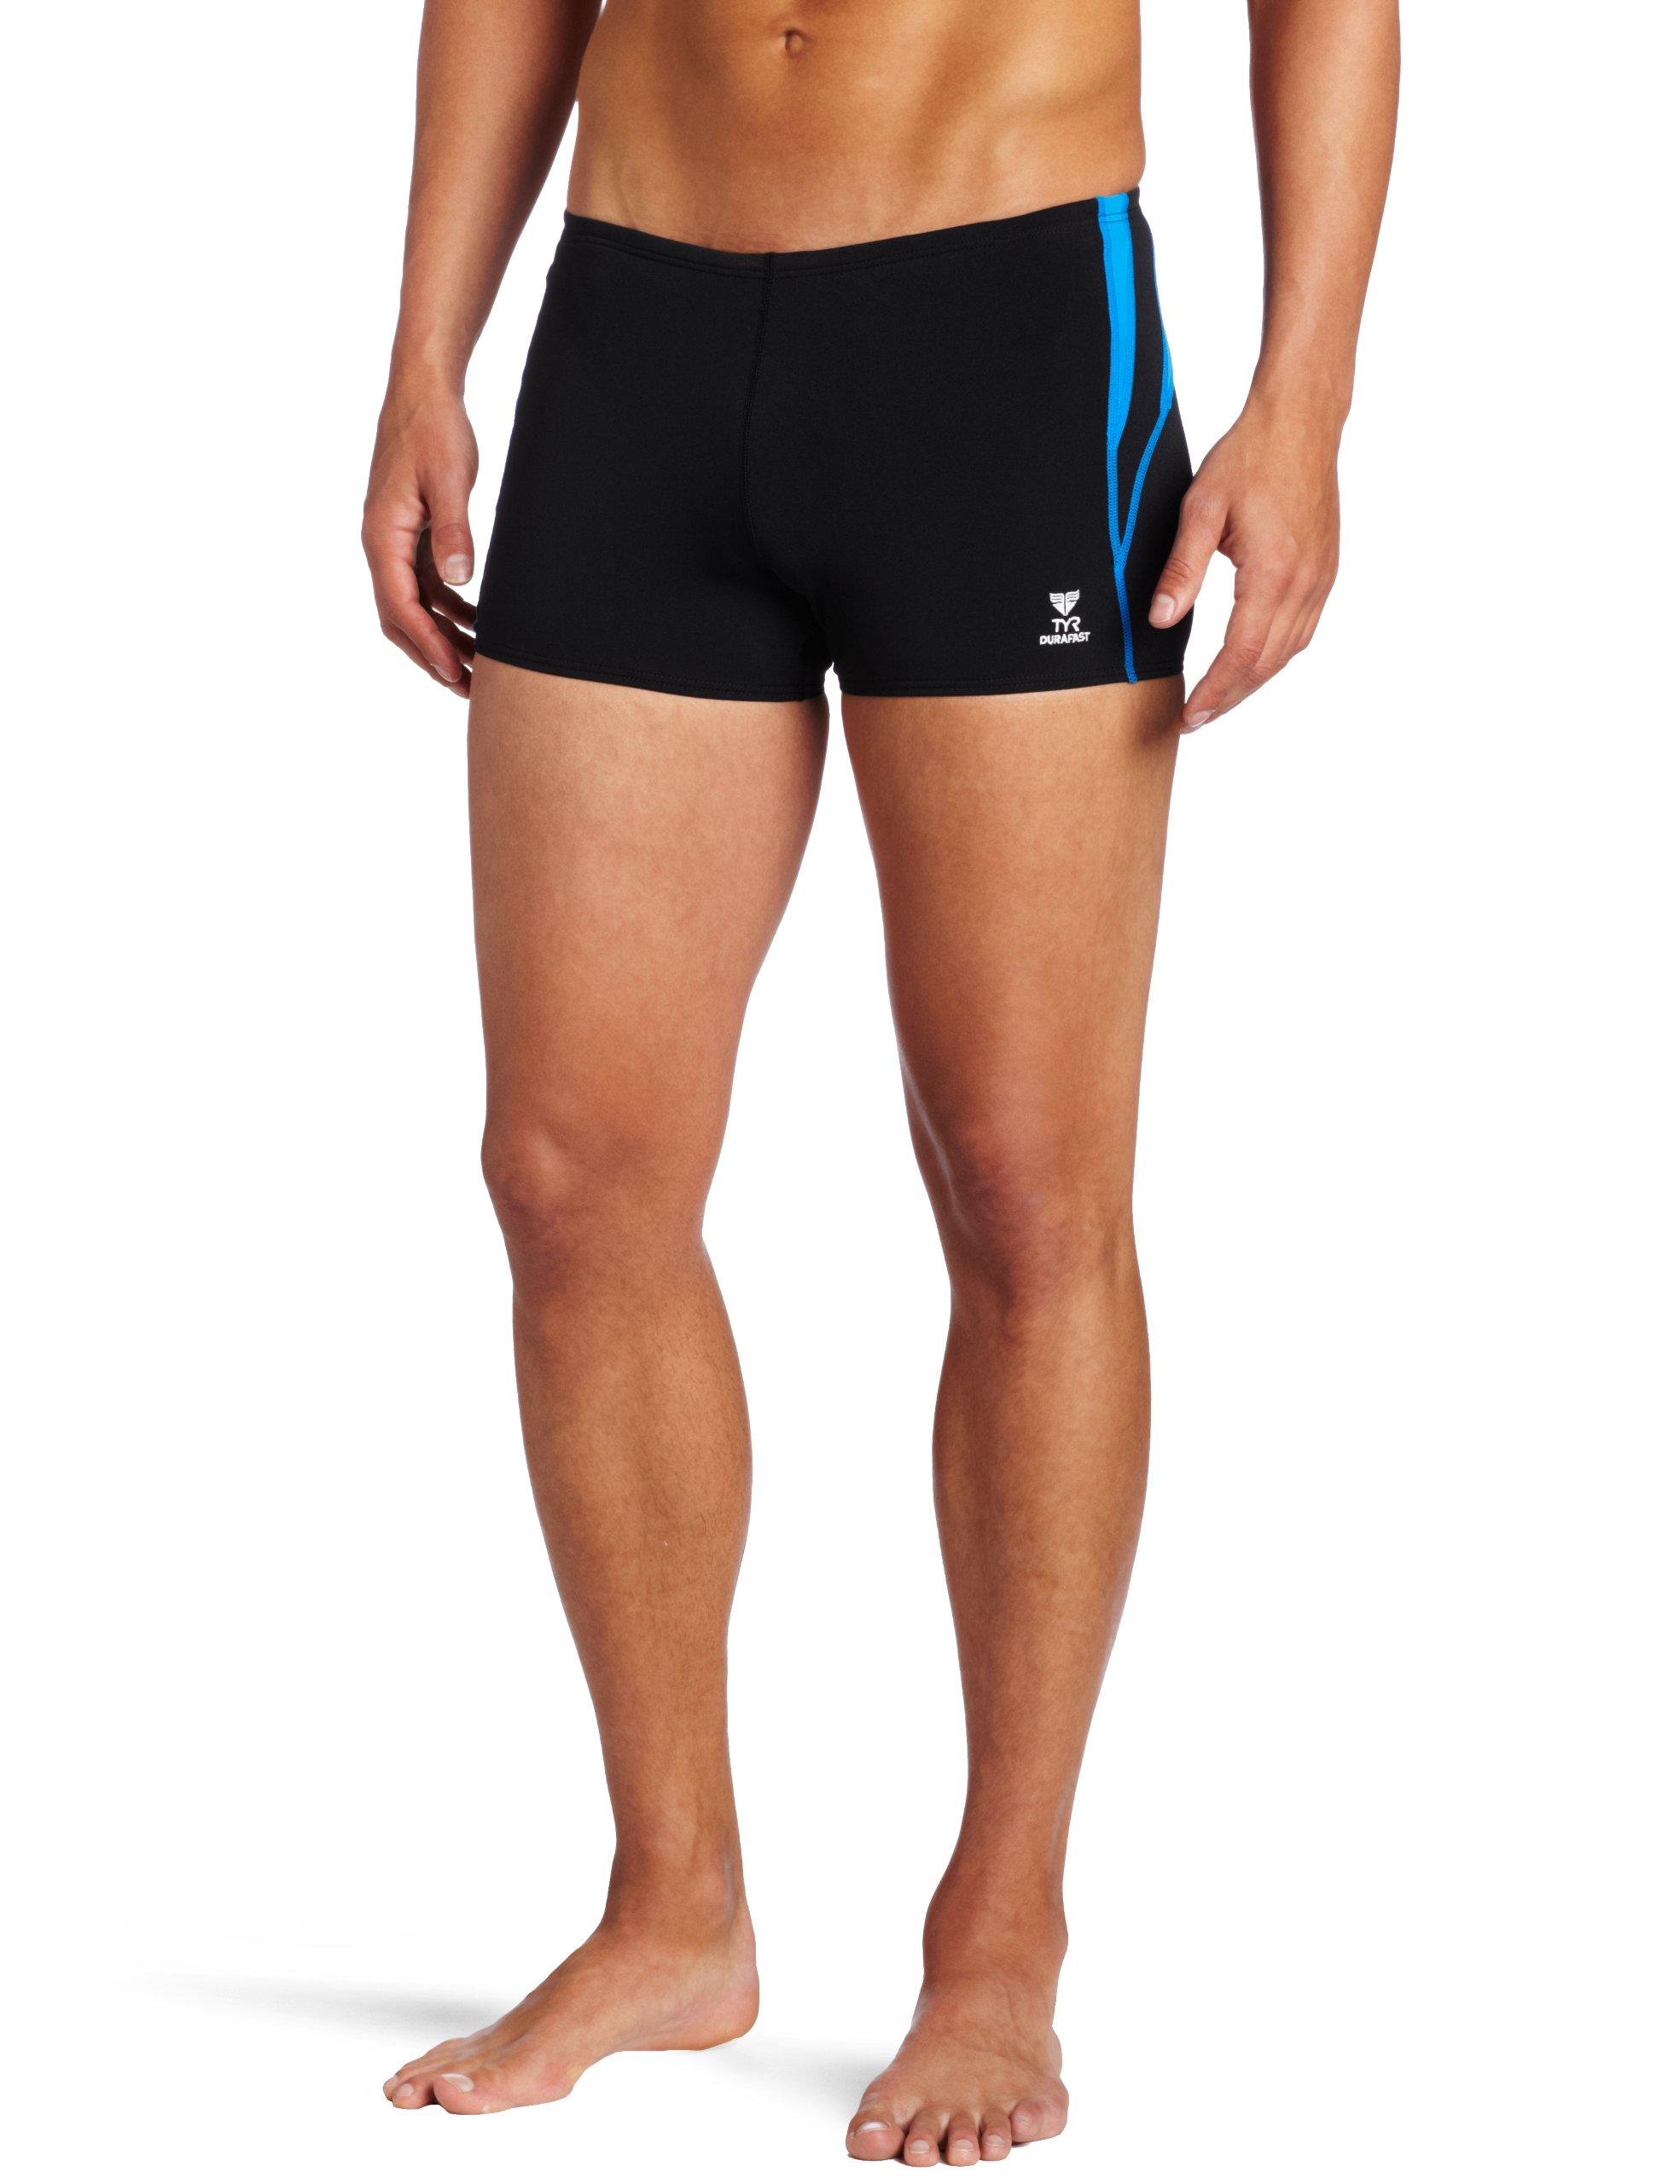 TYR  Men's Alliance Durafast Splice Square Leg Swim Suit (Black/Blue, 34)